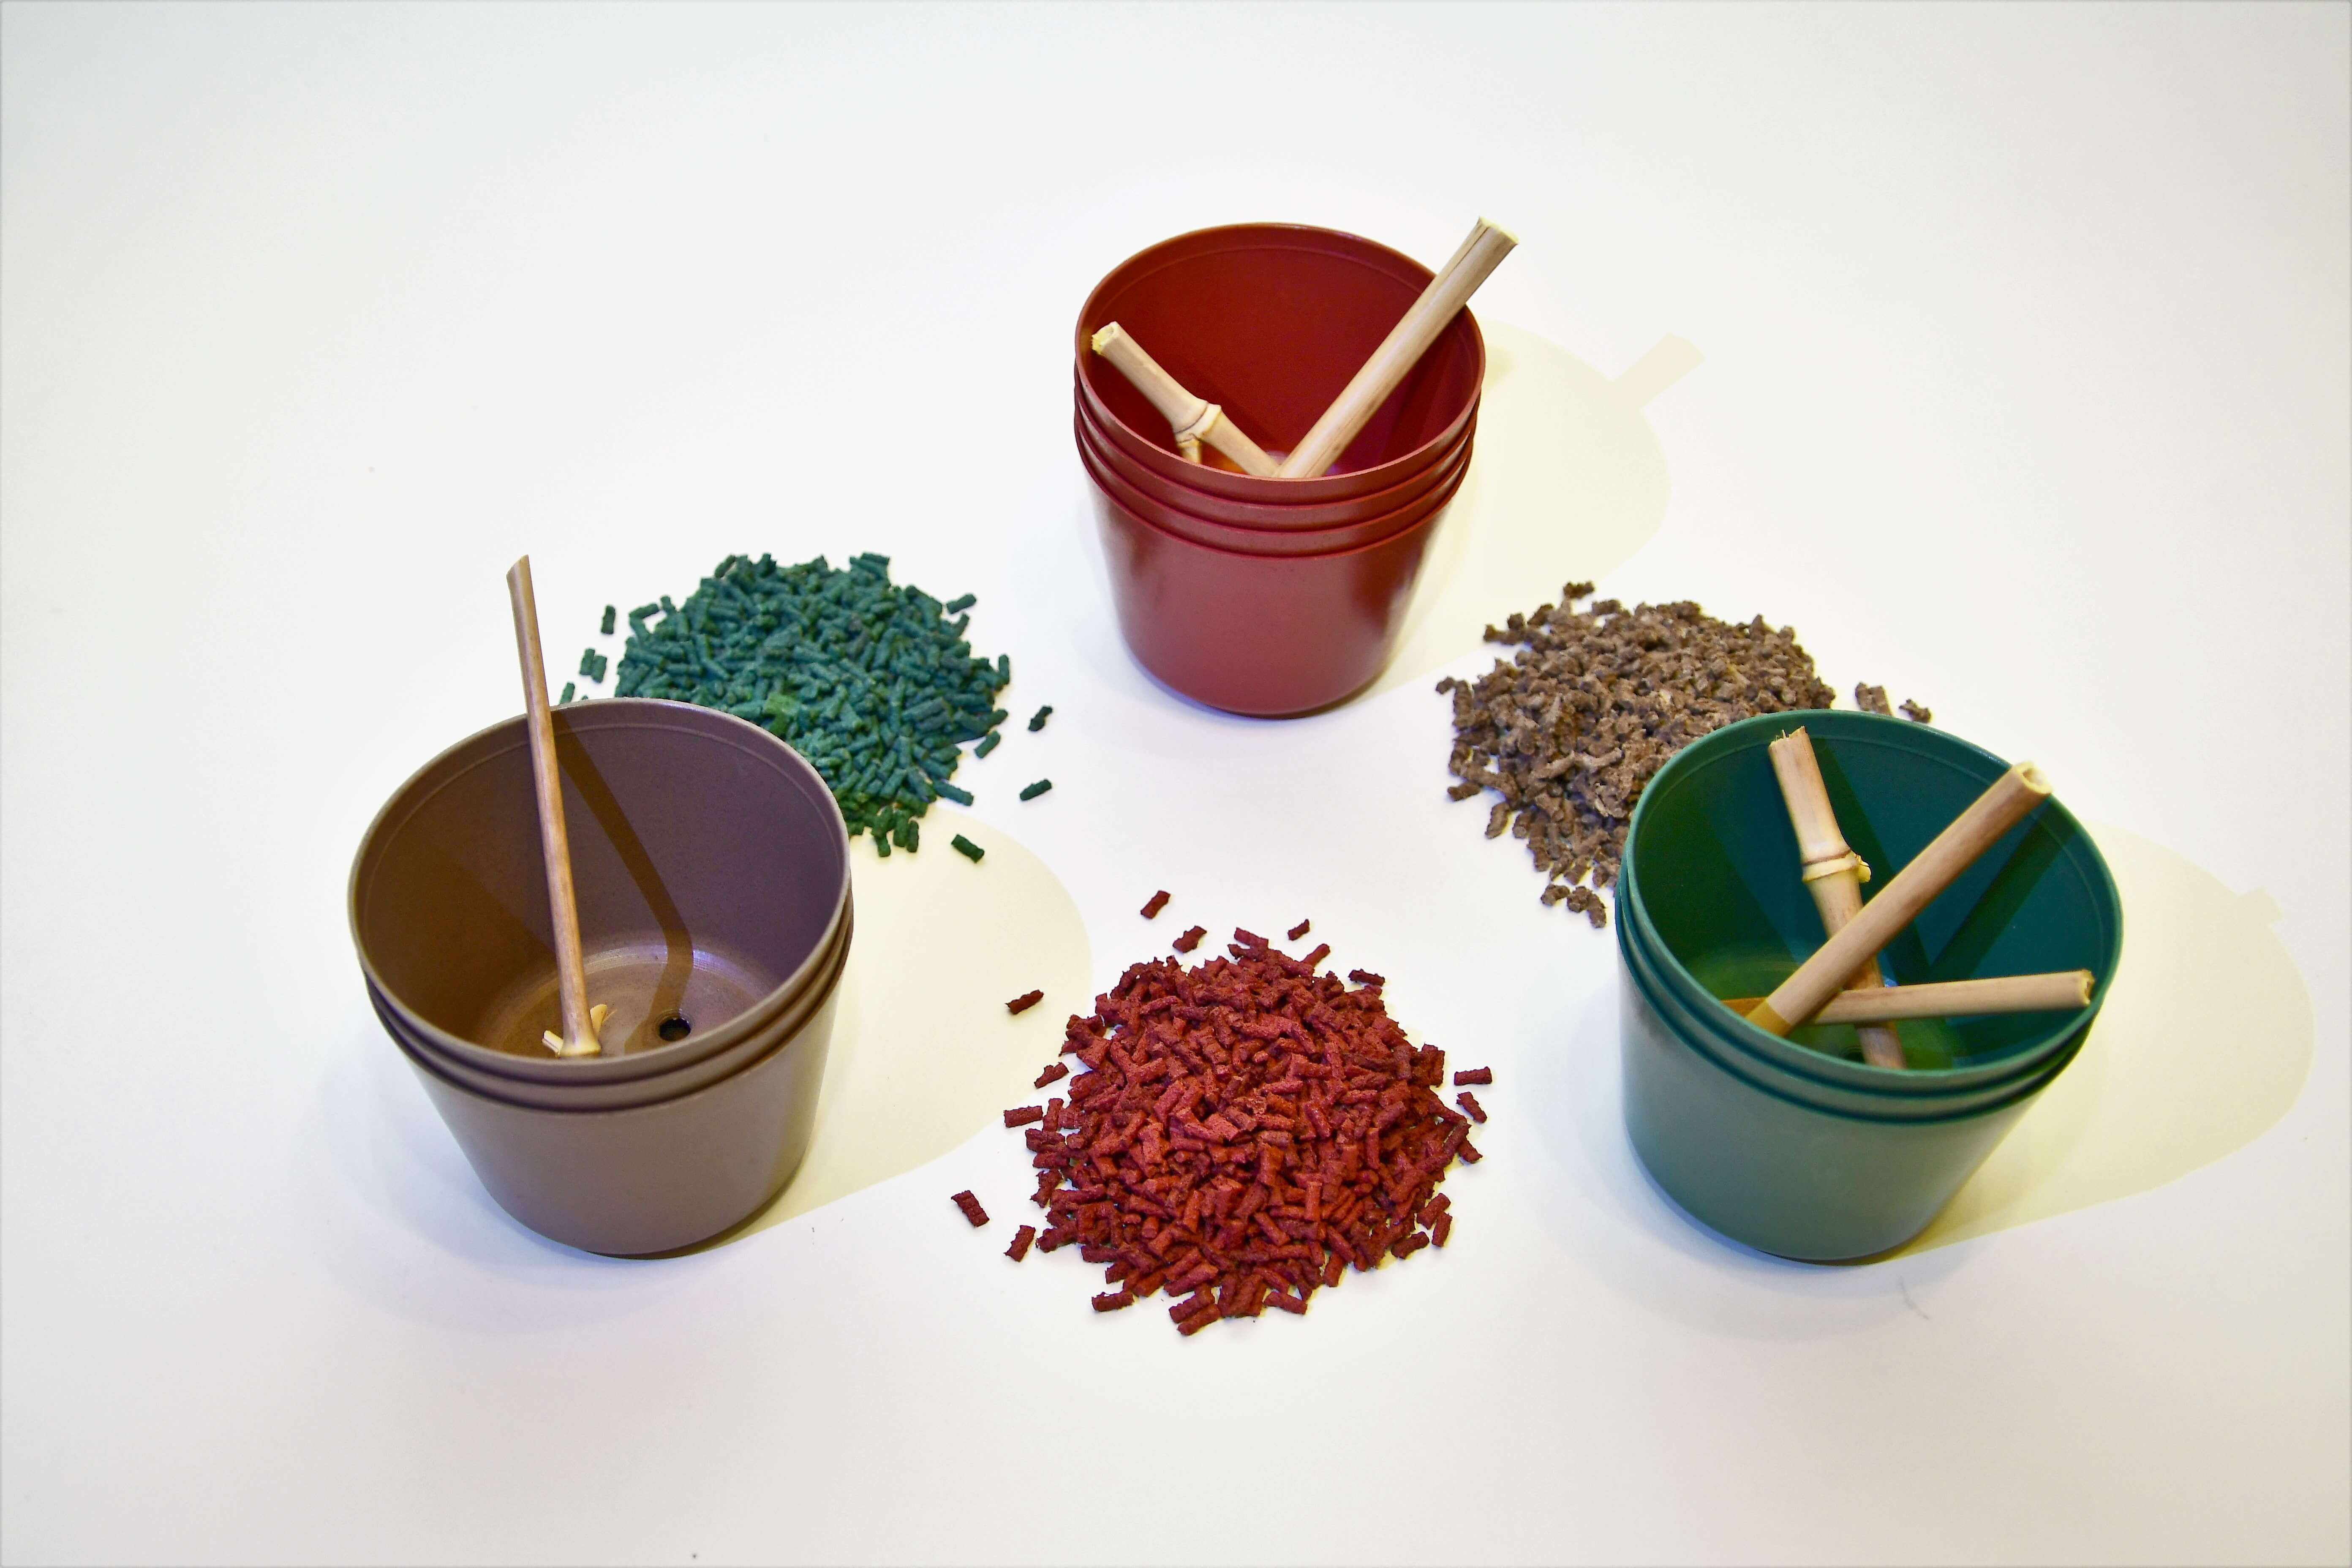 Home - Bioplastic pot